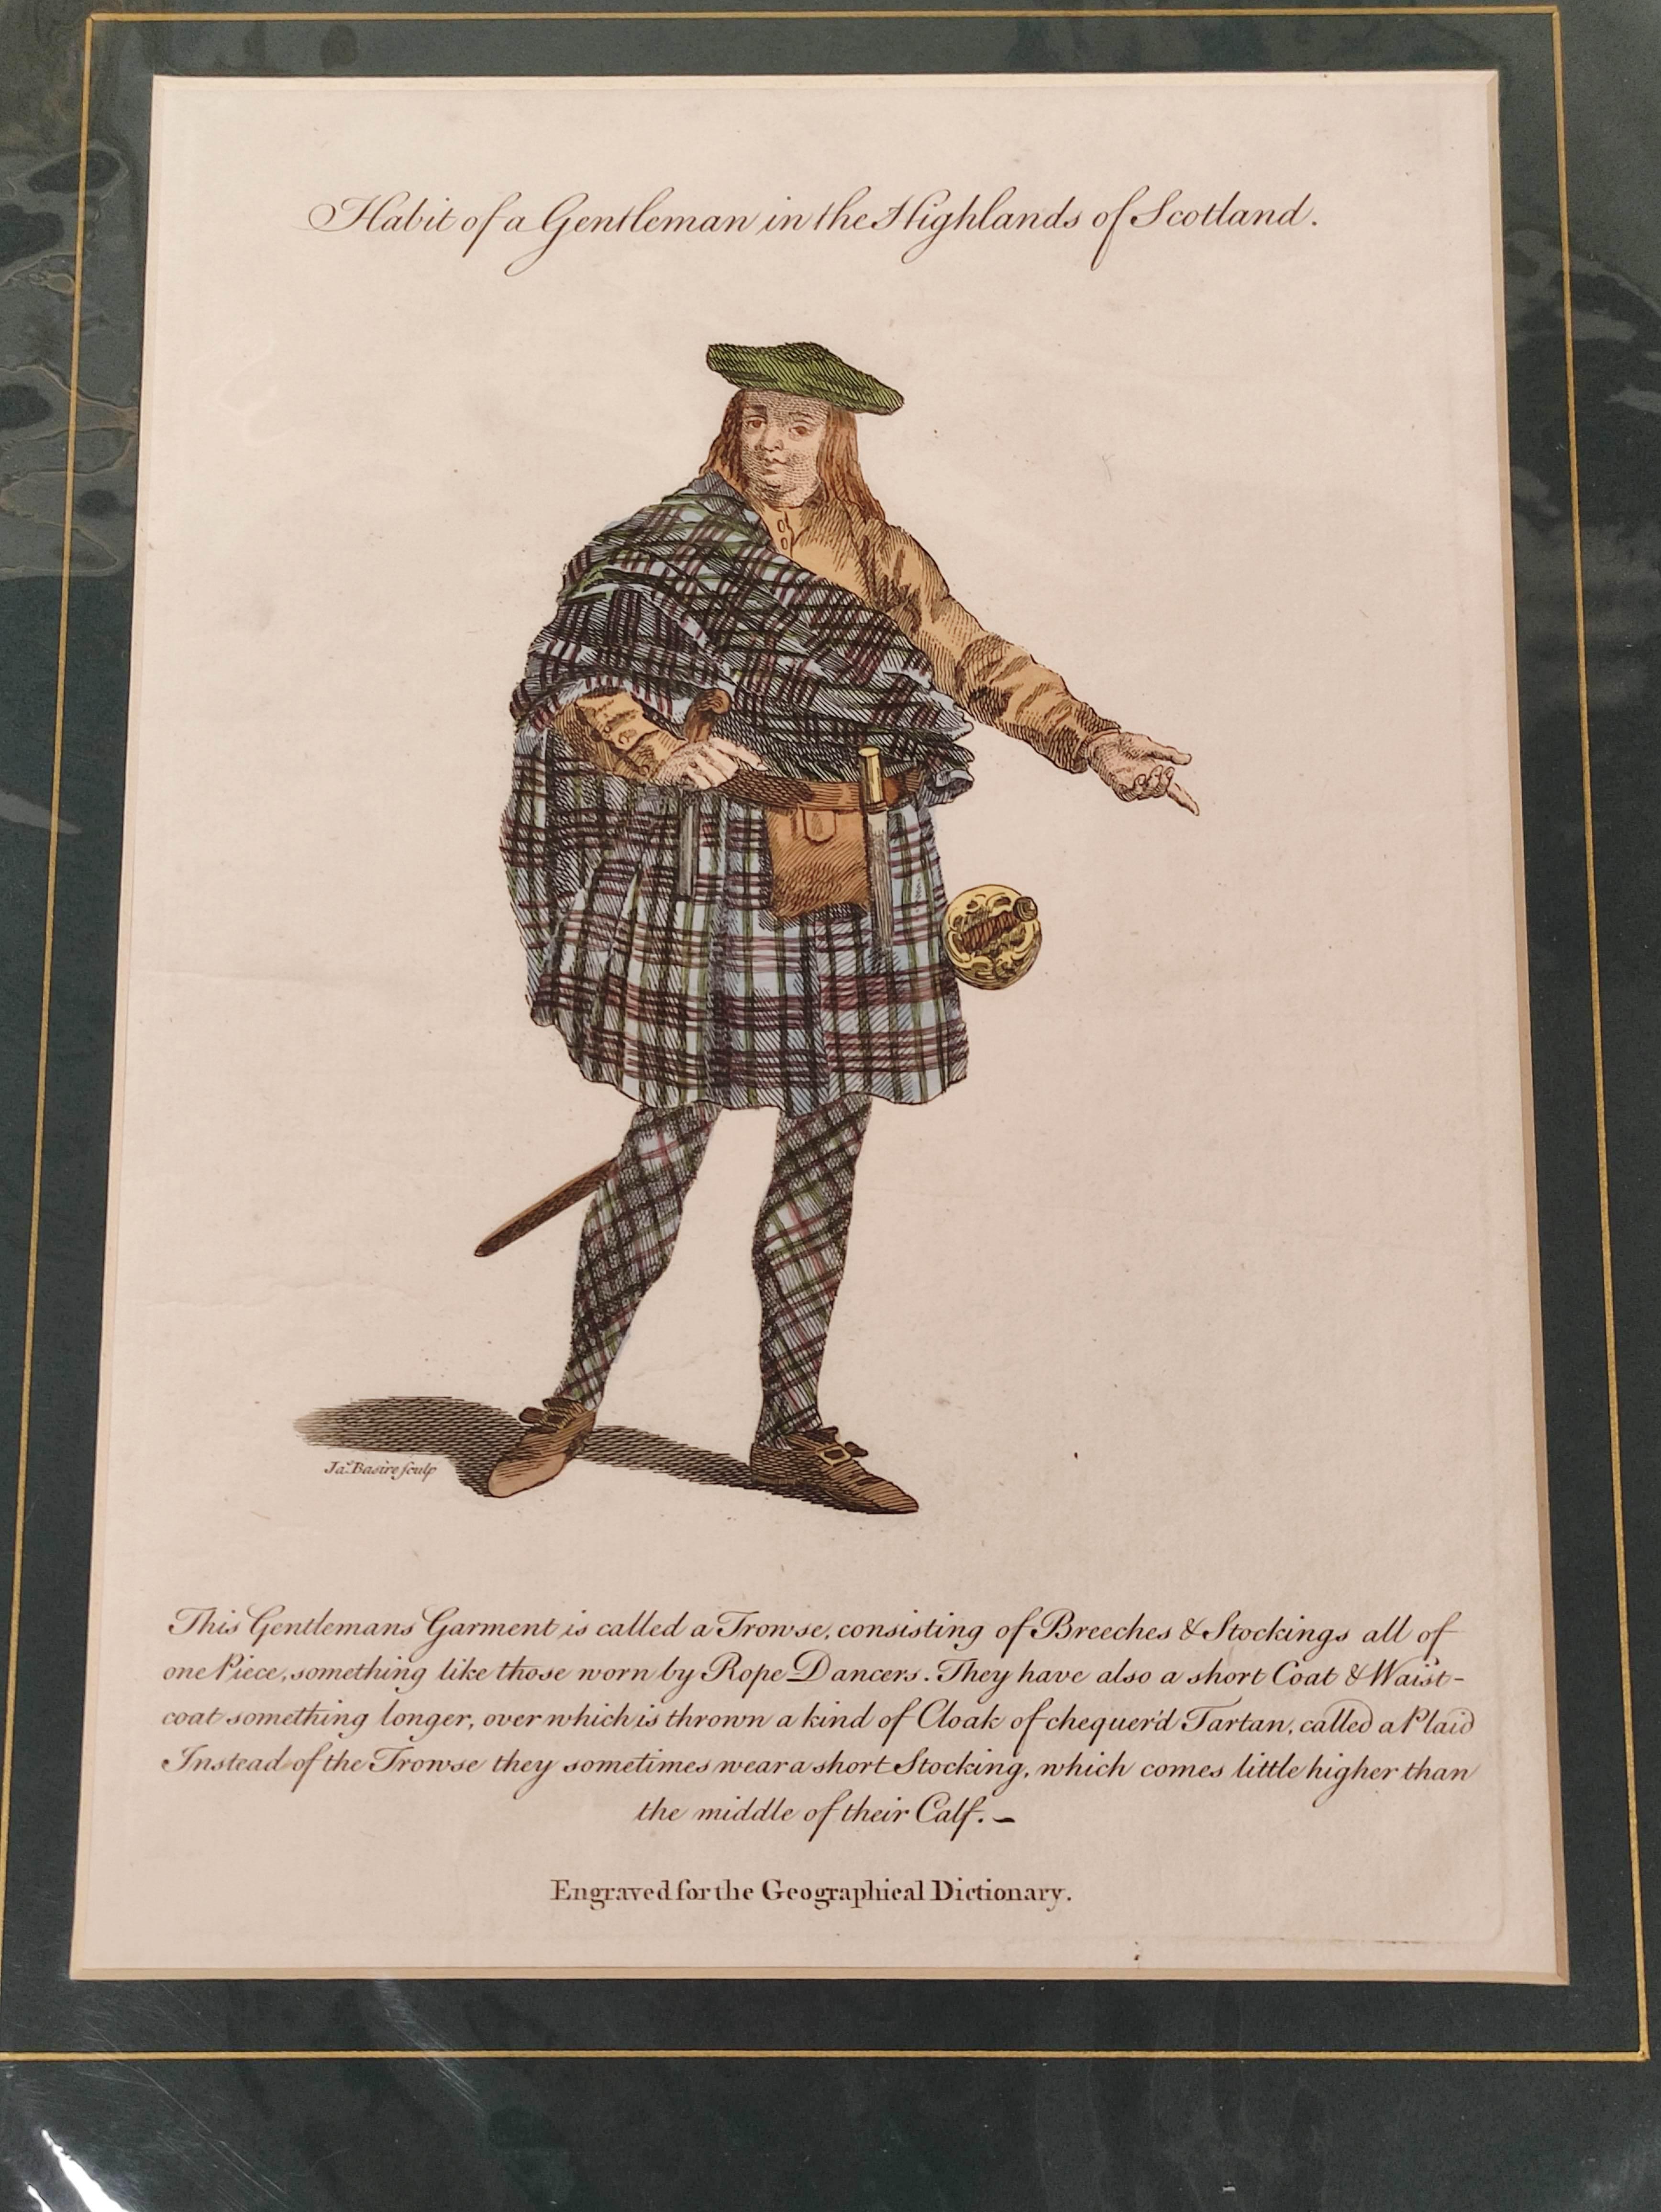 Highland Costume.4 hand coloured engraved plates, 2 framed. - Image 5 of 6